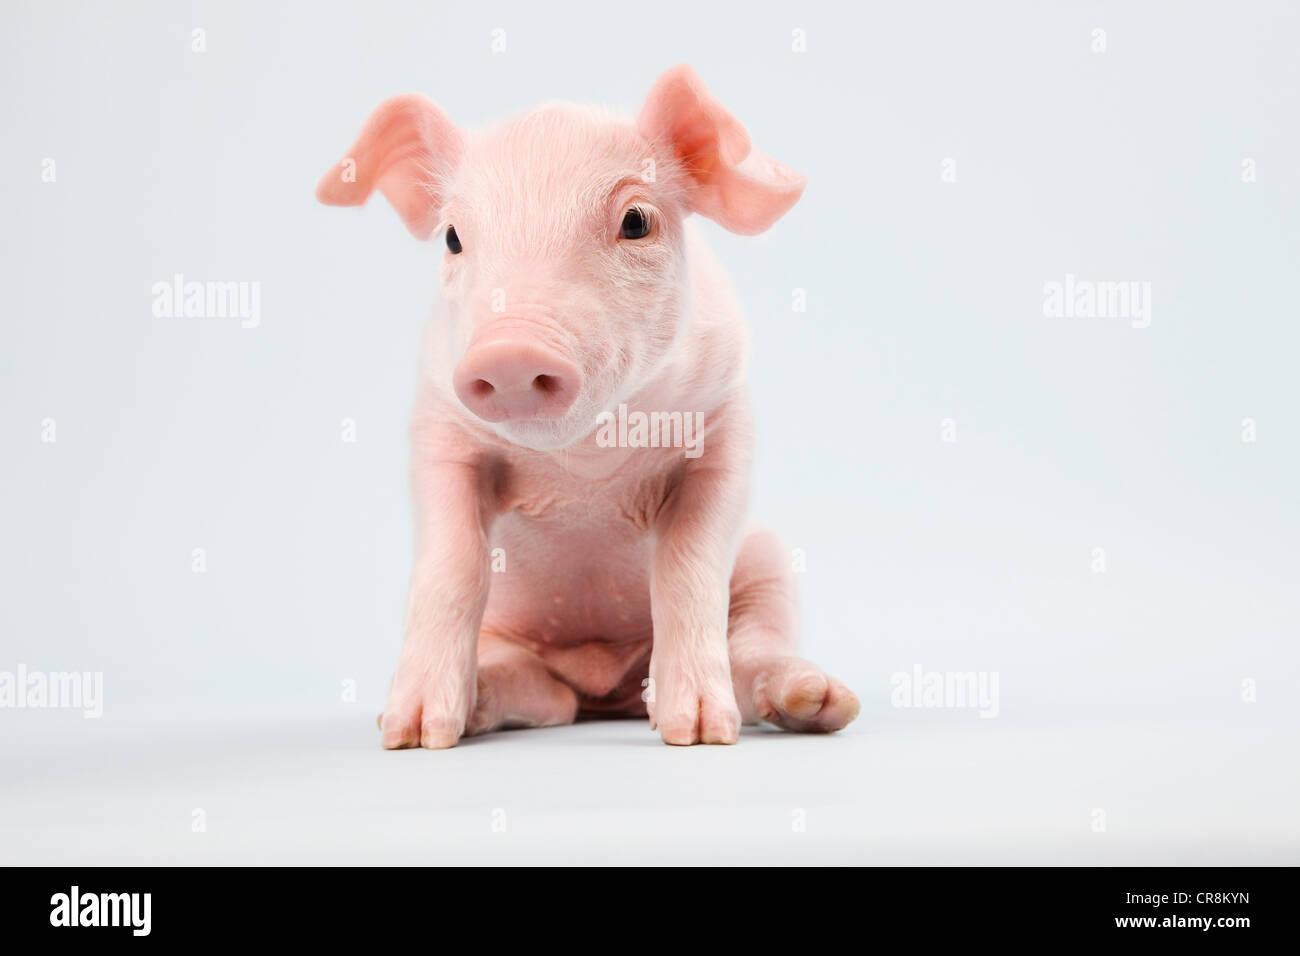 Cute piglet, studio shot Photo Stock